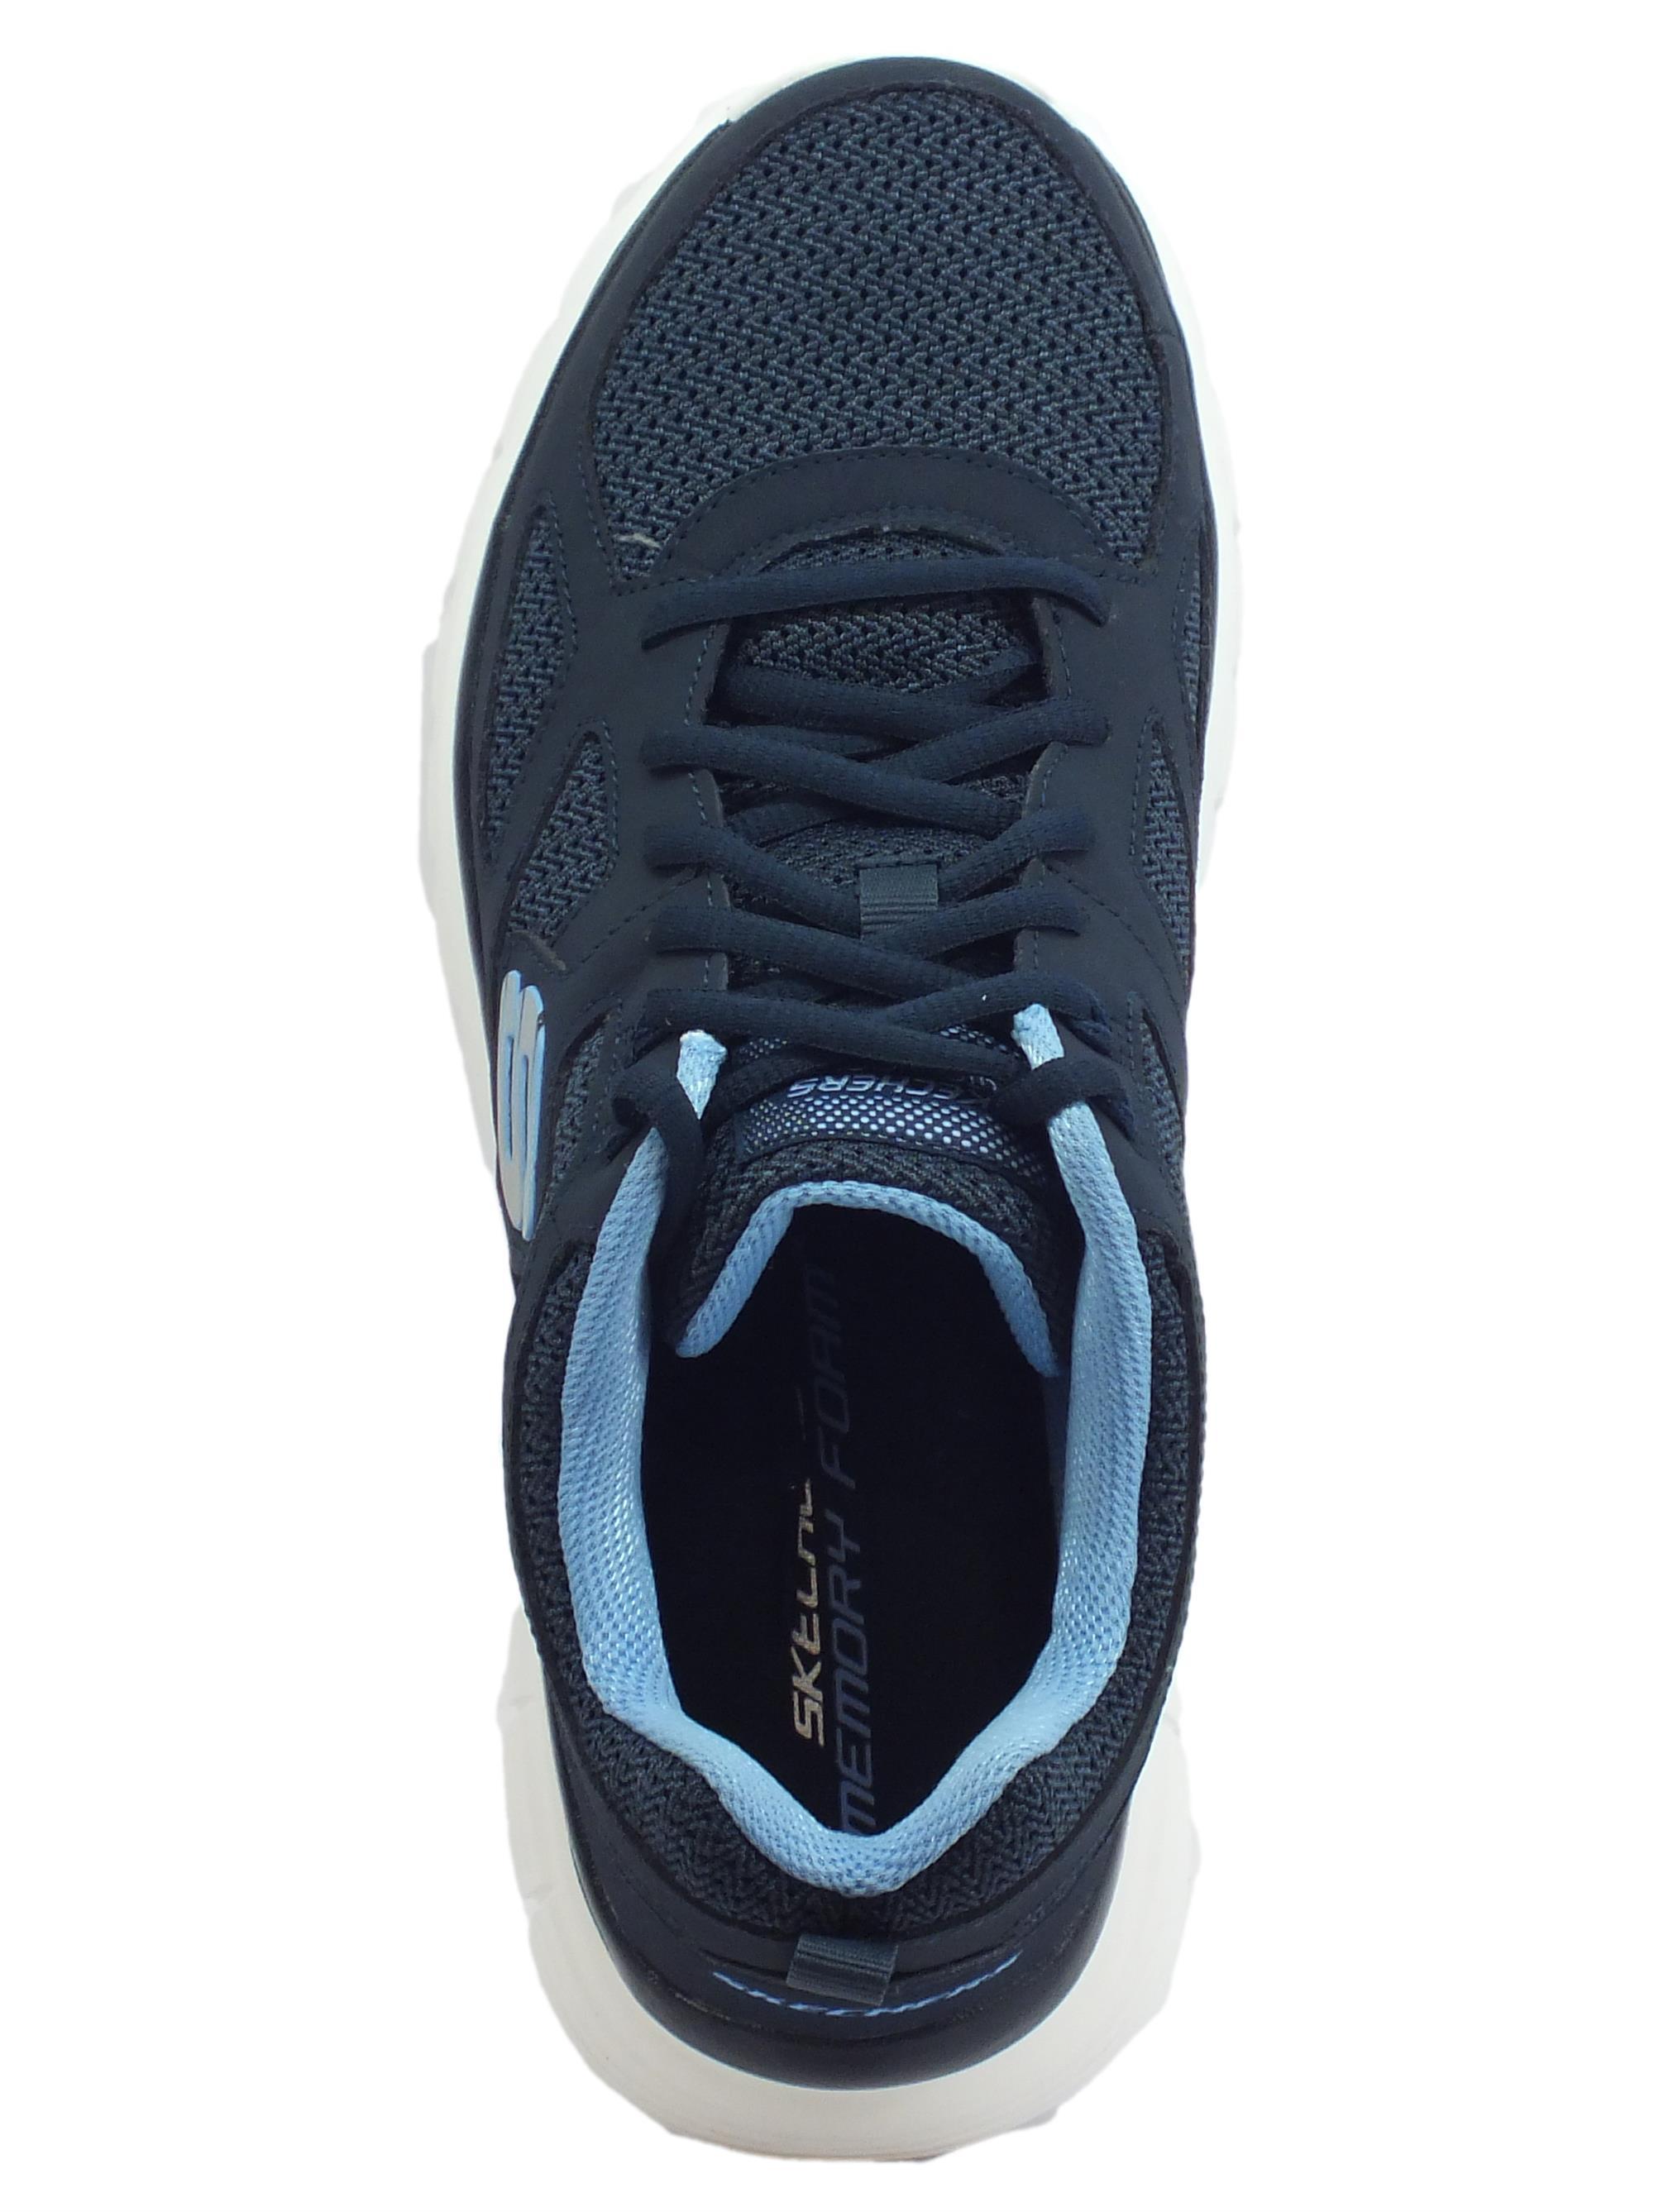 ... Skechers Sport Burns Agoura scarpe sportive uomo in pelle e tessuto blu  e celeste 4b7b9b25ed6